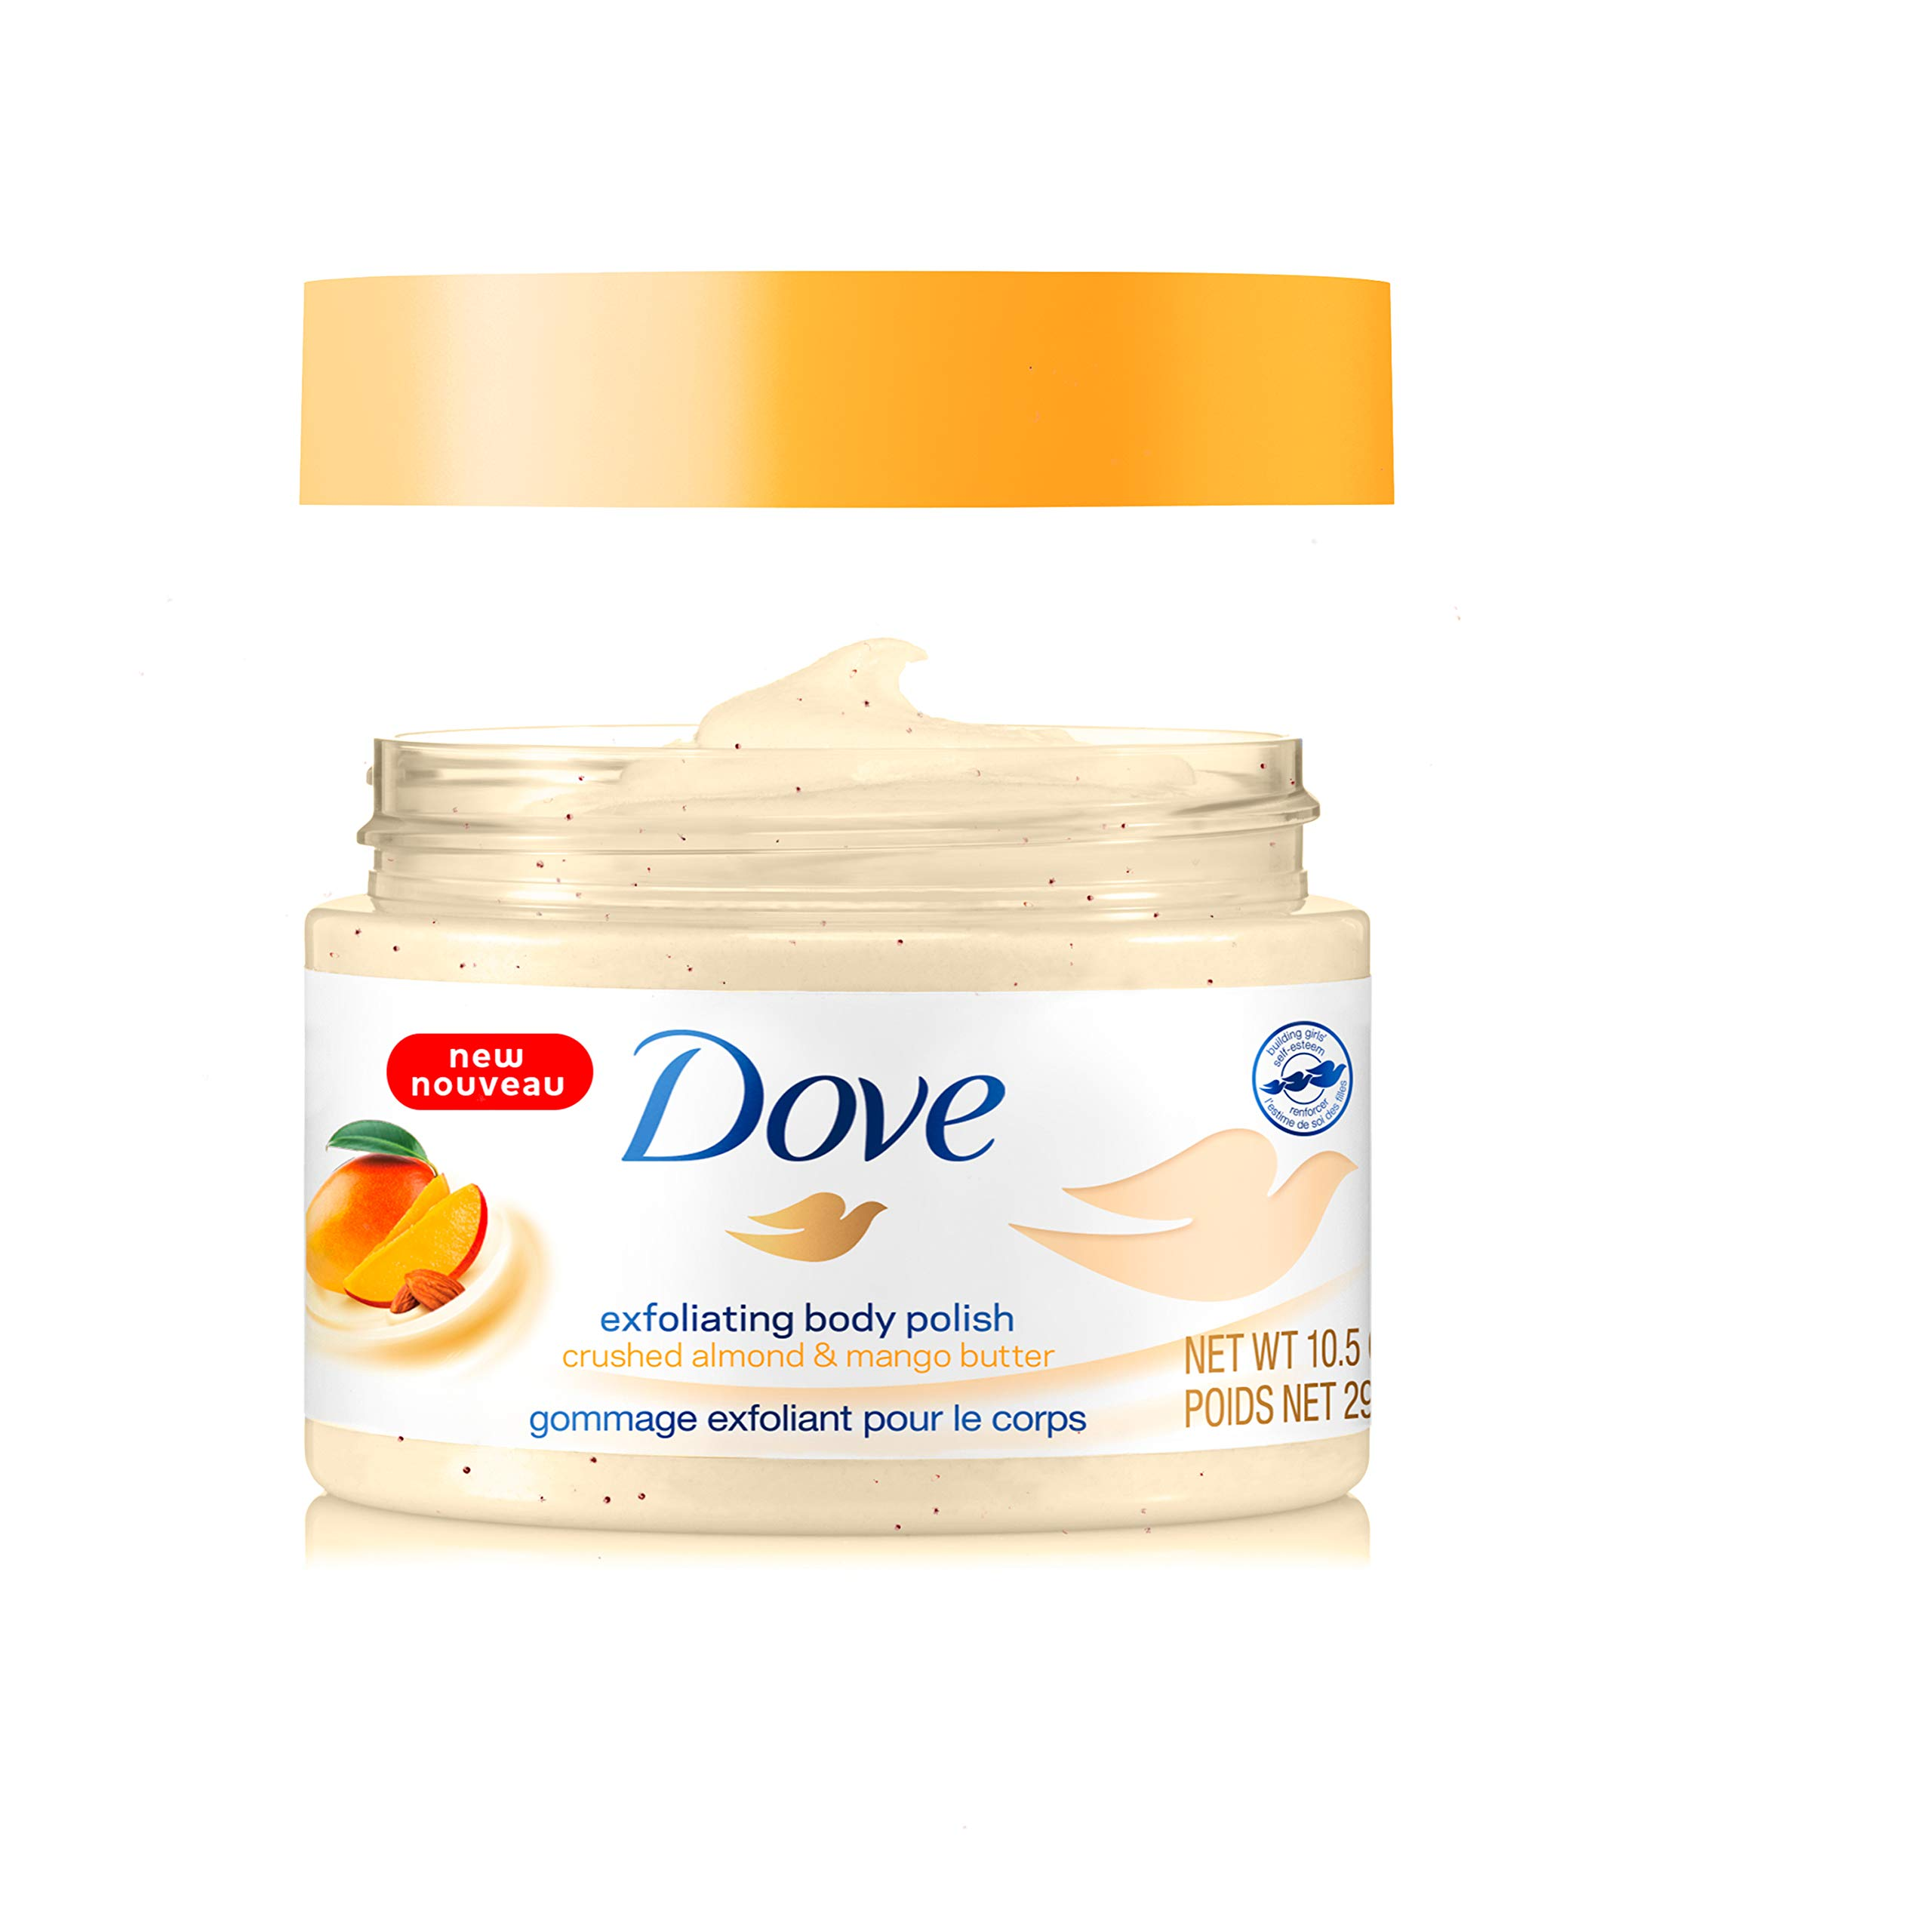 Dove Exfoliating Body Polish Body Scrub Buy Online In Pakistan At Desertcart